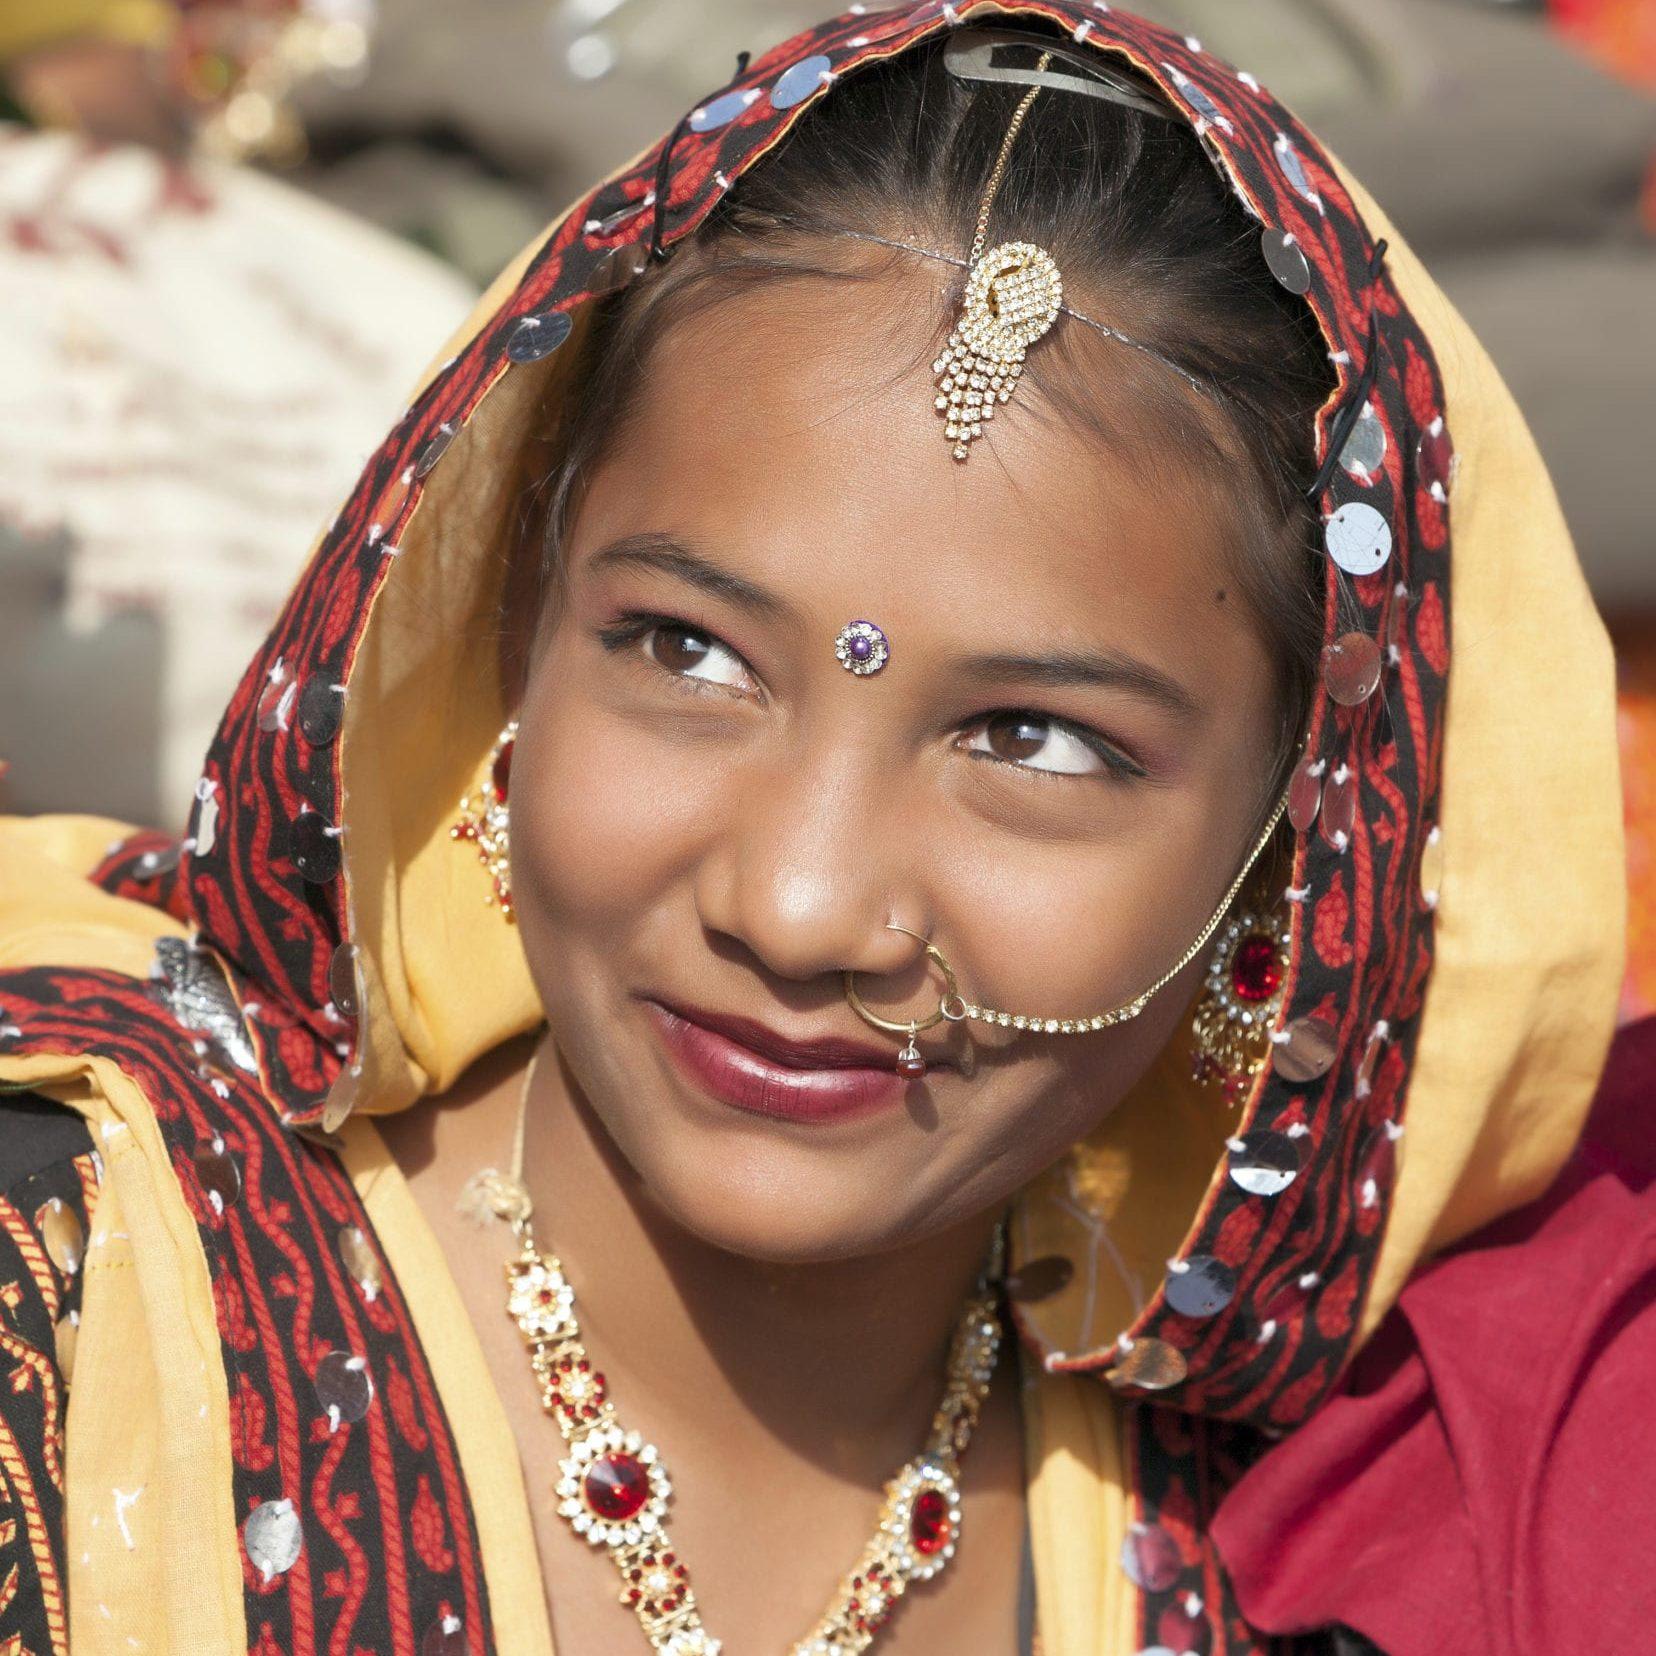 PUSHKAR, INDIA - NOVEMBER 21: An unidentified girl  in colorful ethnic attire attends at the Pushkar fair on November 21, 2012 in Pushkar, Rajasthan, India.